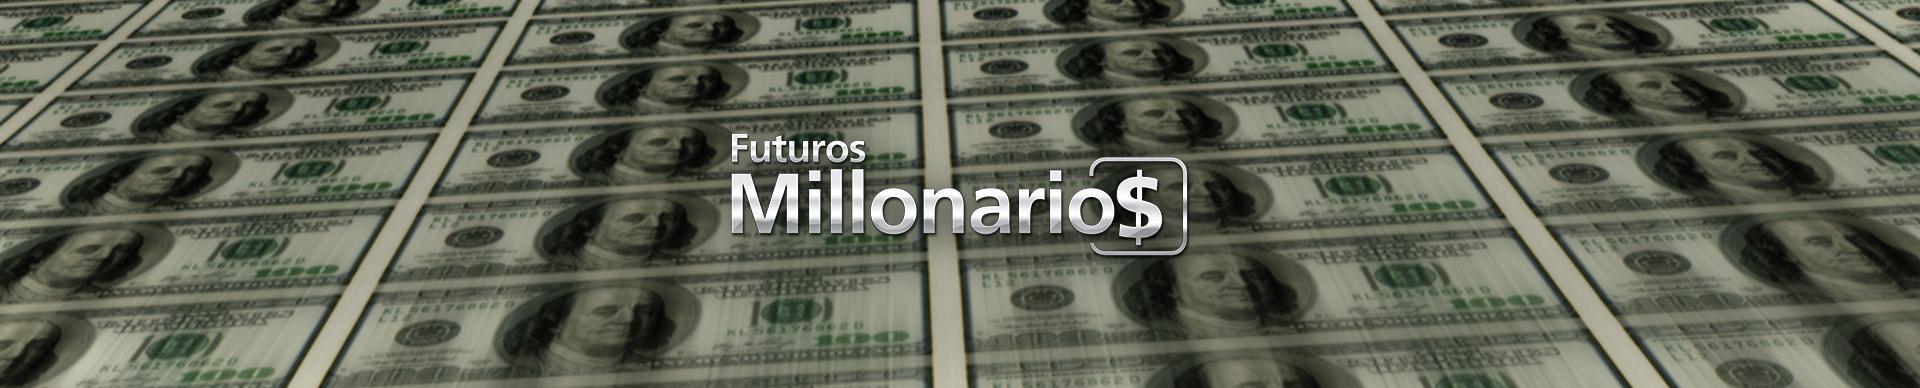 FUTUROS MILLONARIOS